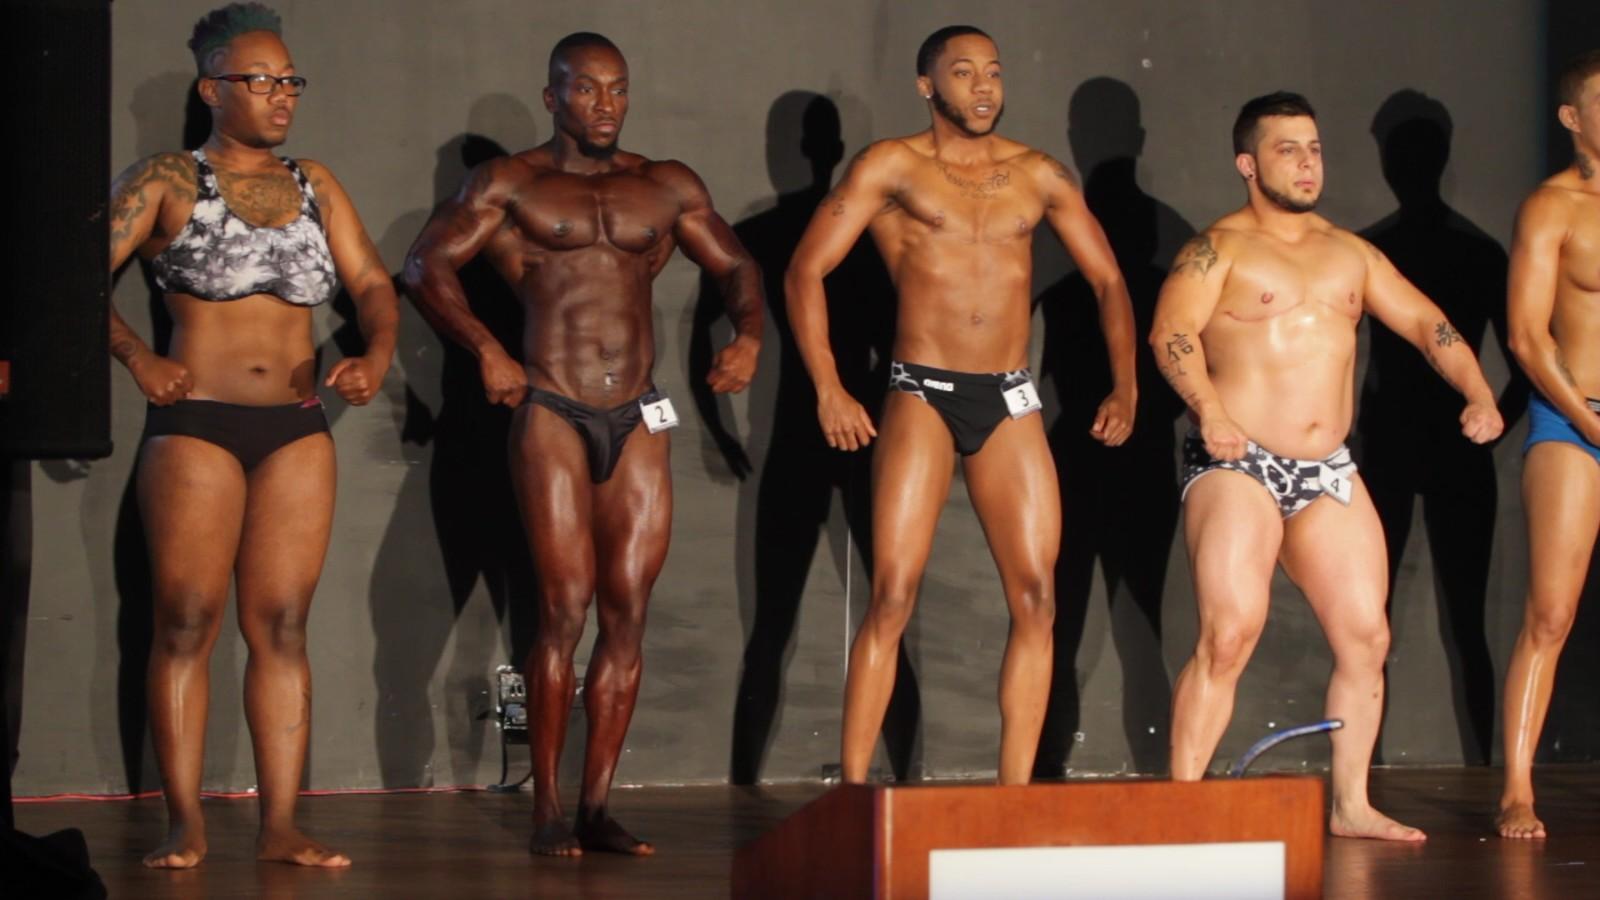 Black lesbian bodybuilder